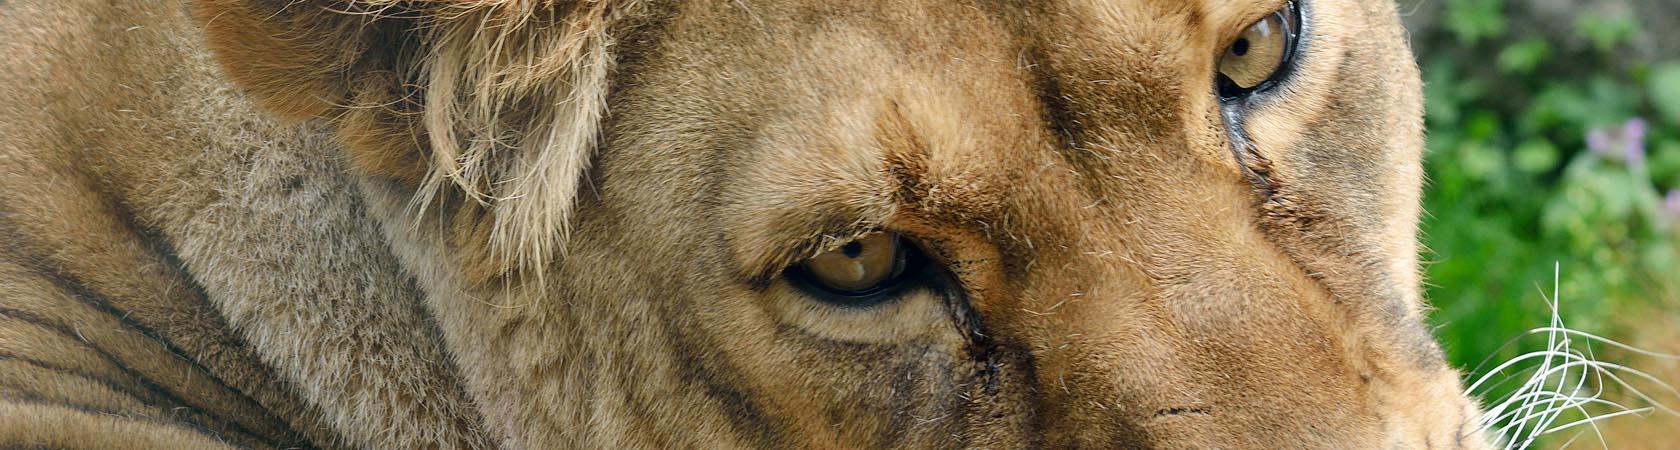 leonessa-le-cornelle-leonardodelfini01